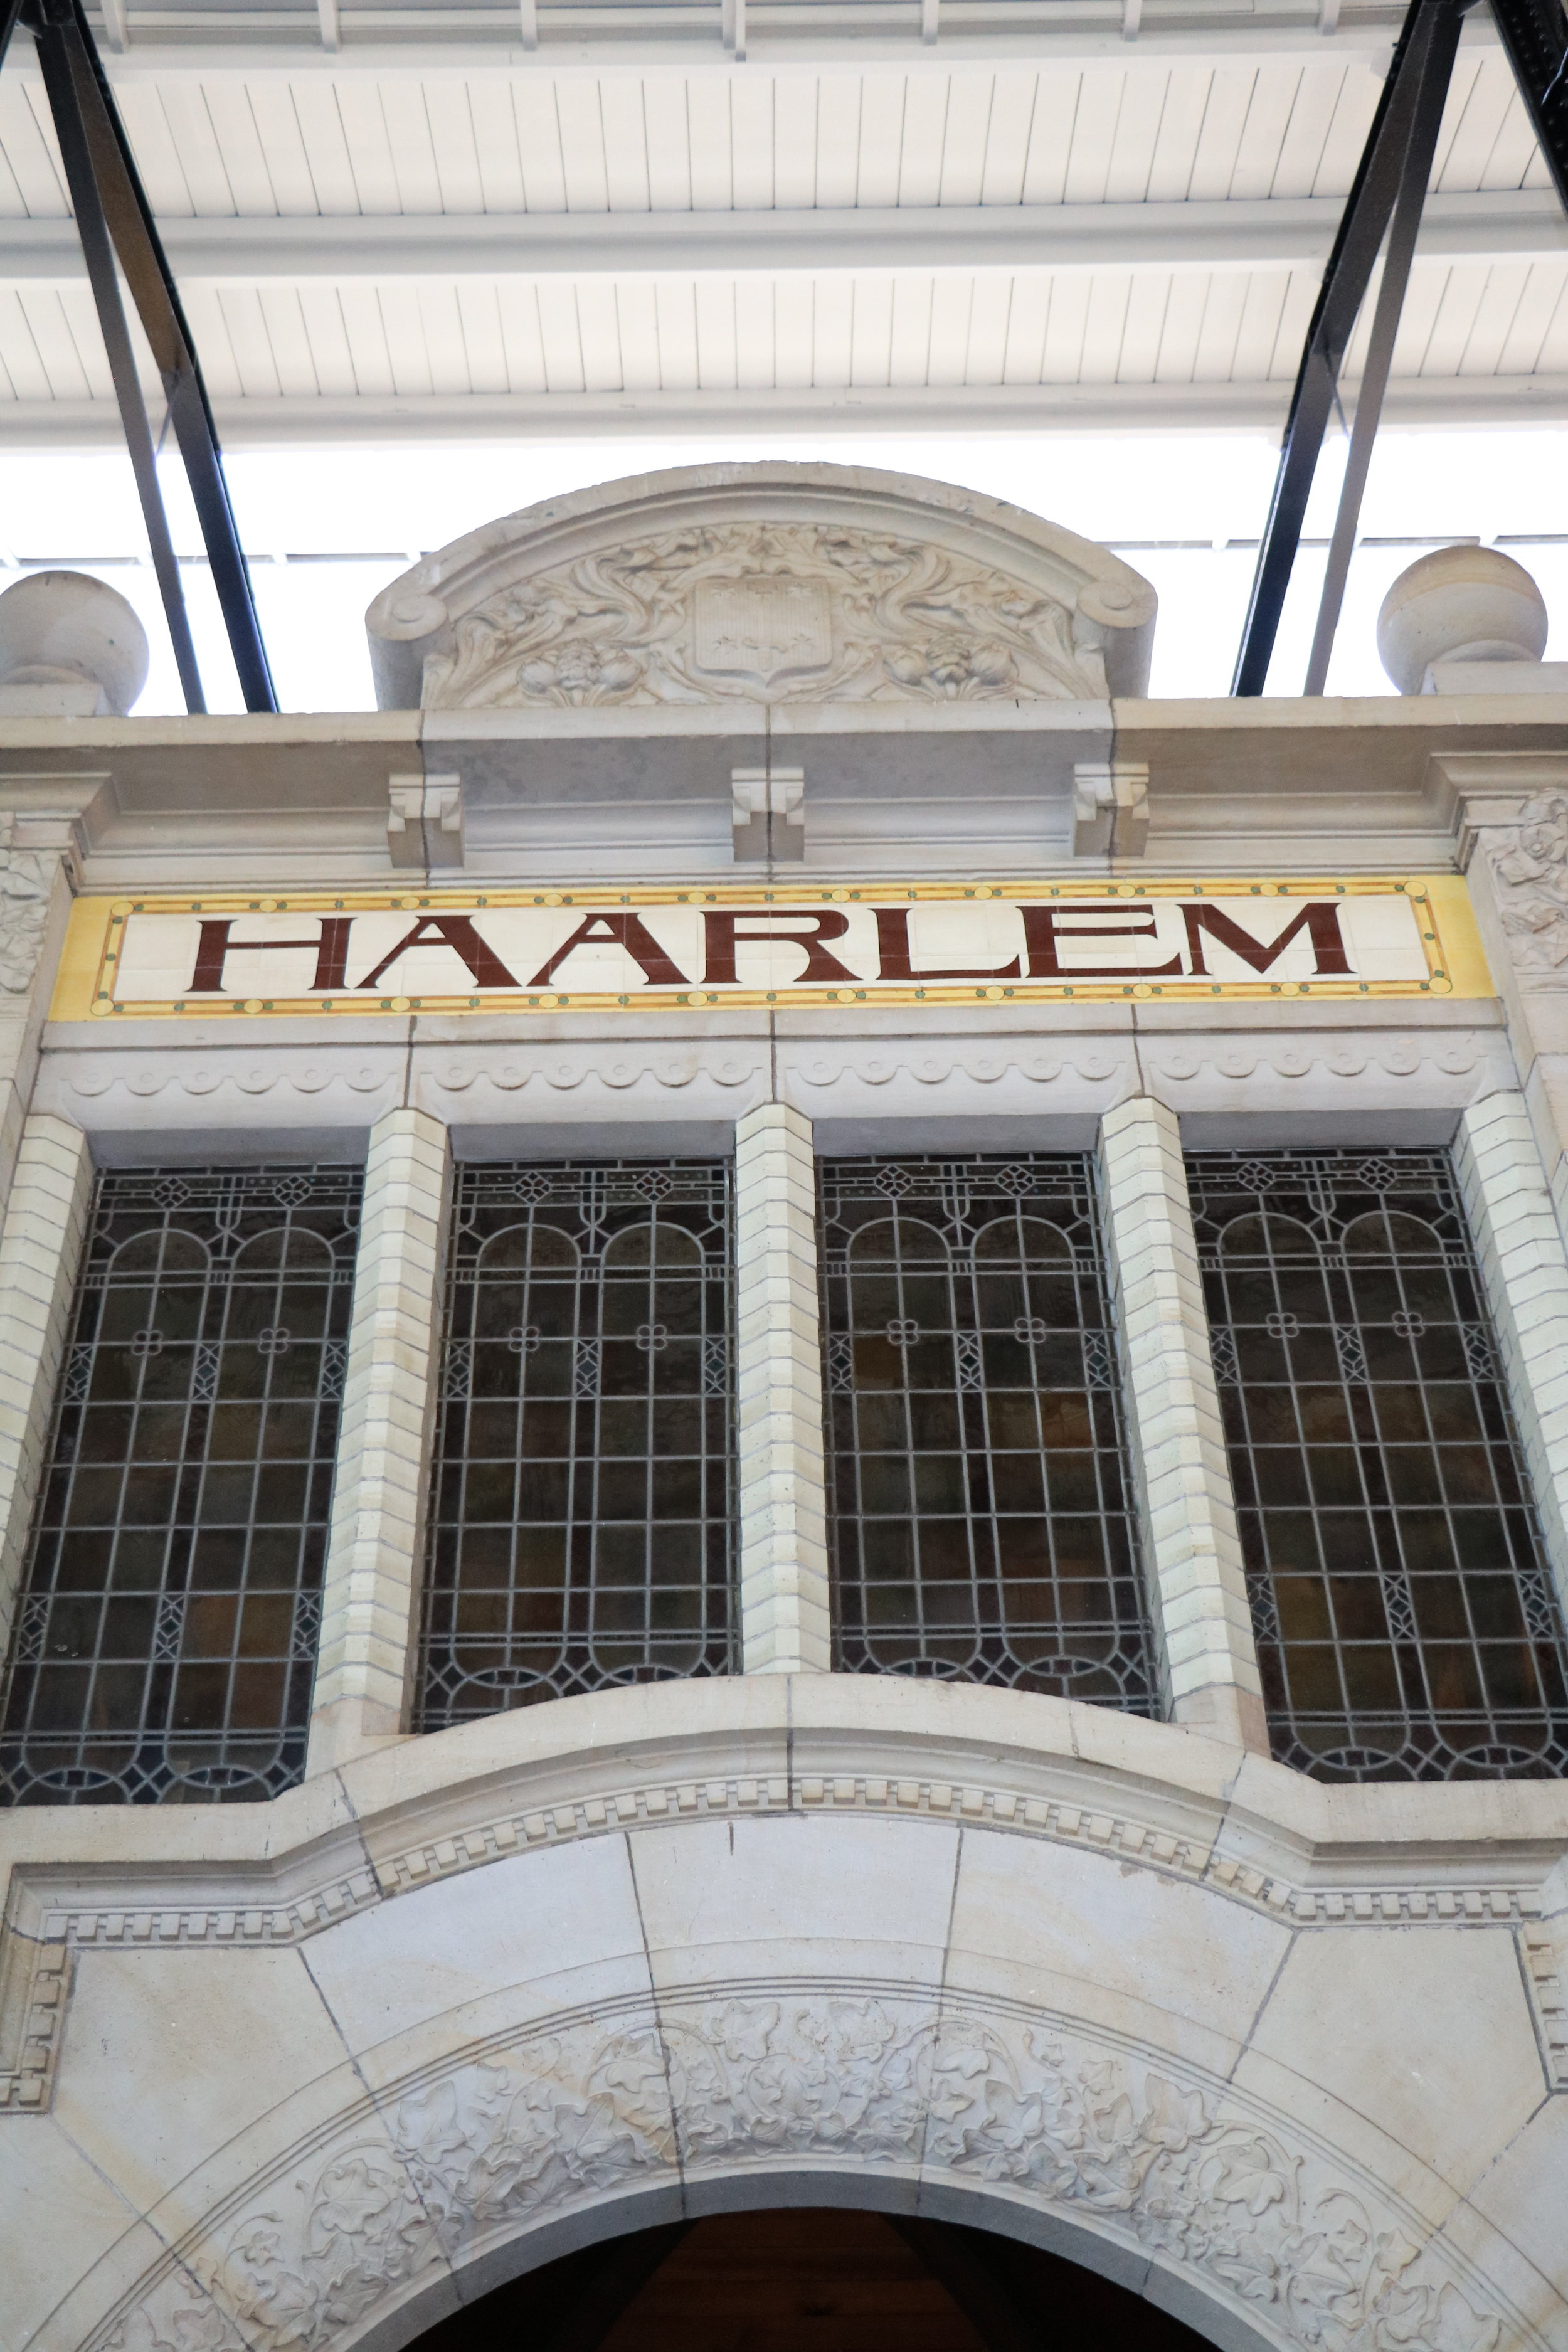 Haarlem-train-station